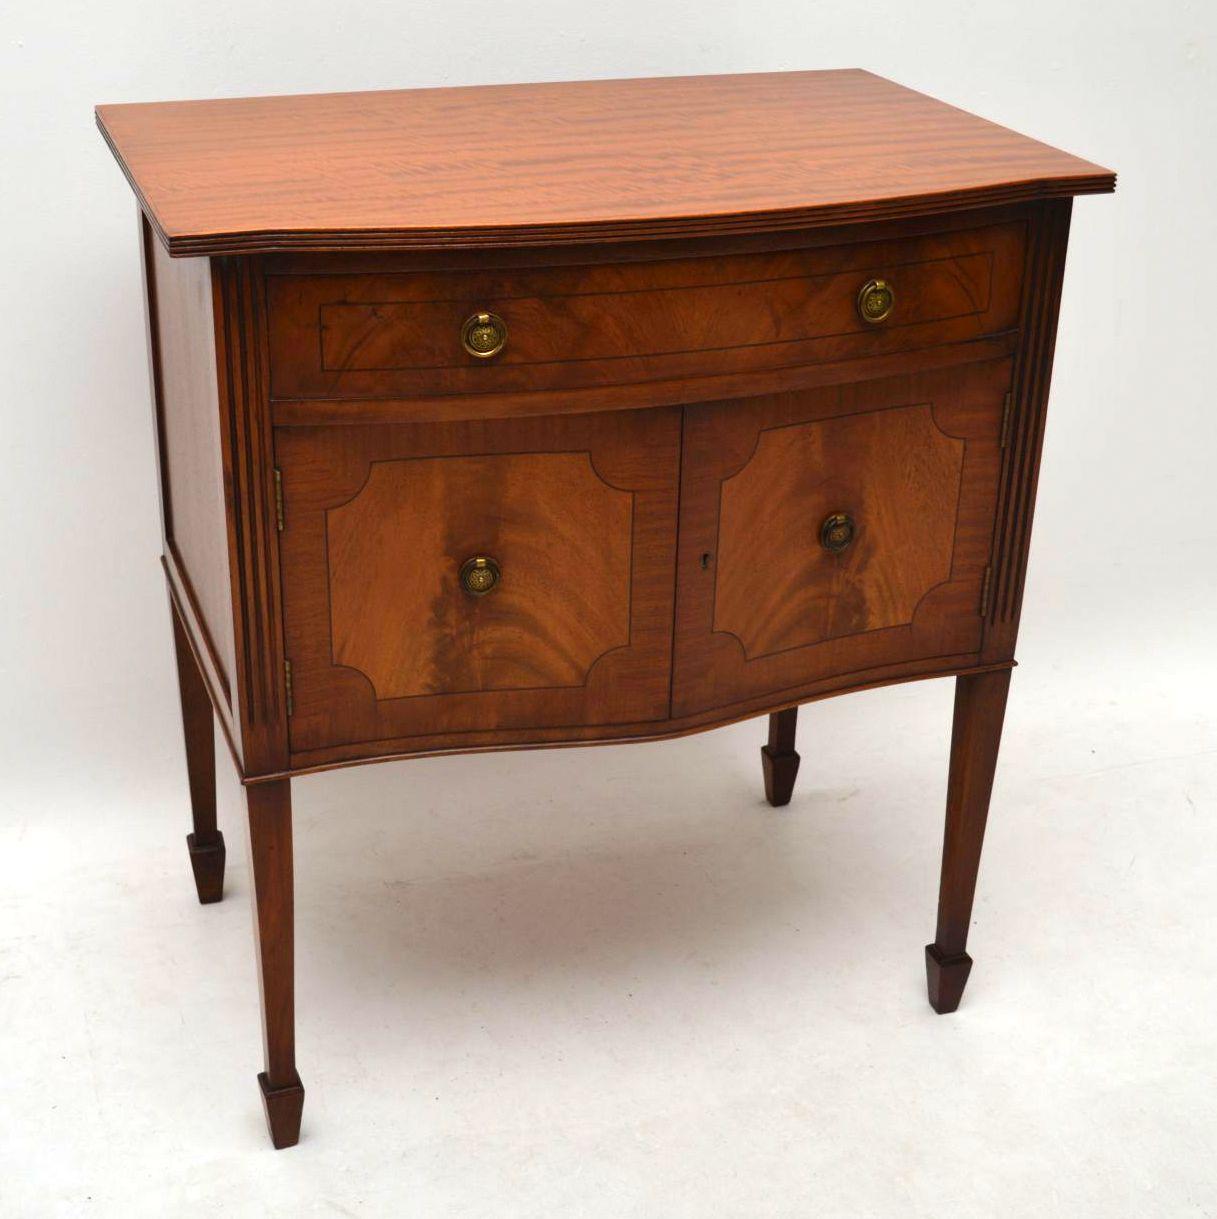 Antique Inlaid Mahogany Cabinet on Legs